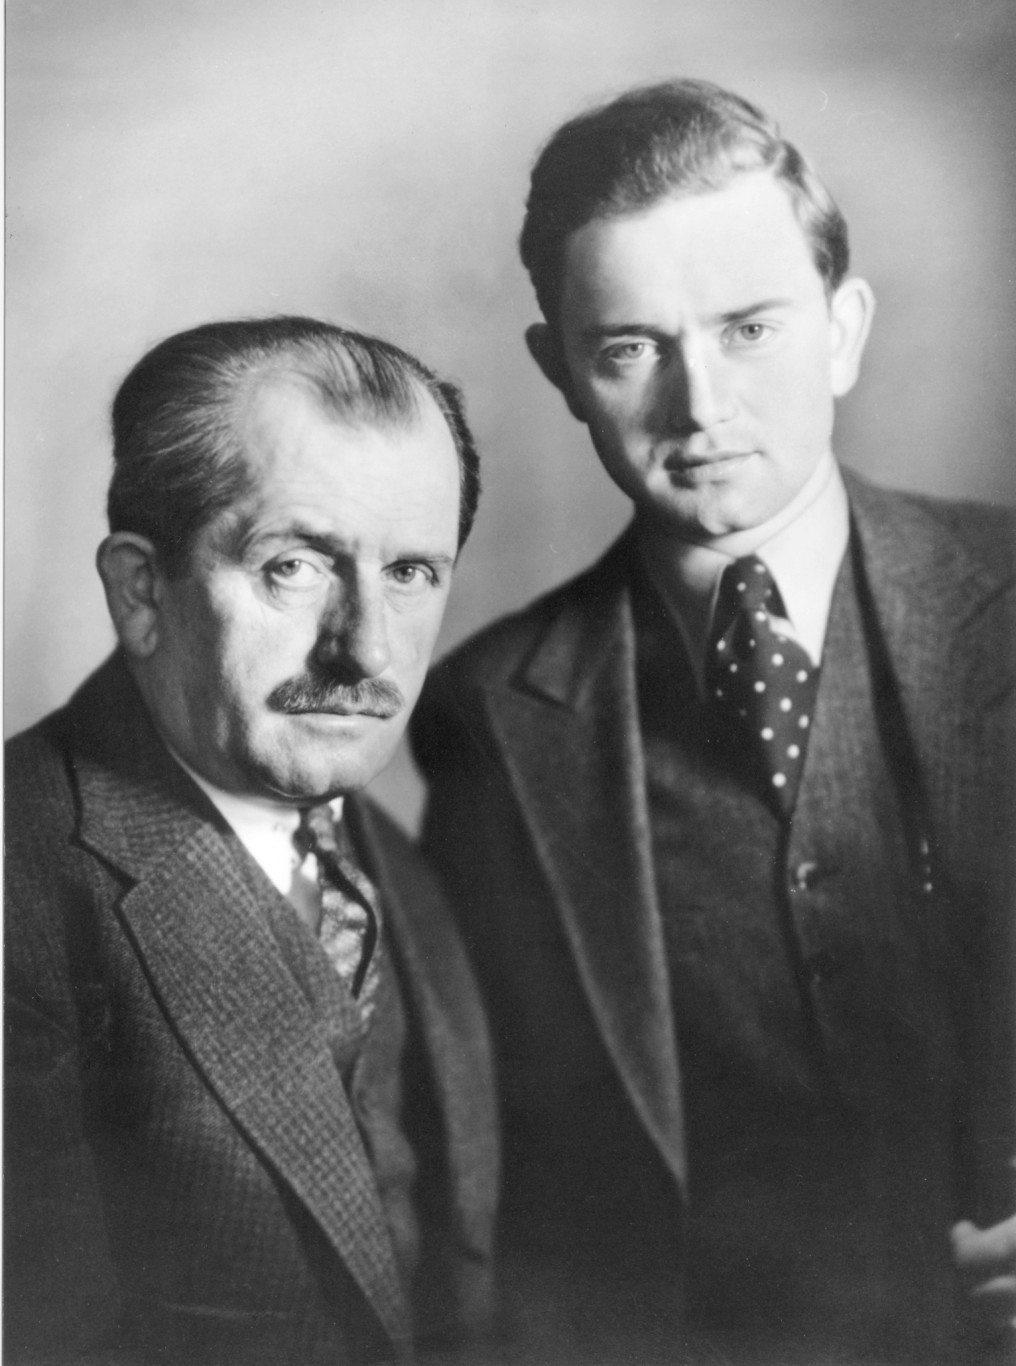 Ferdinand Porsche and his son Ferry Porsche